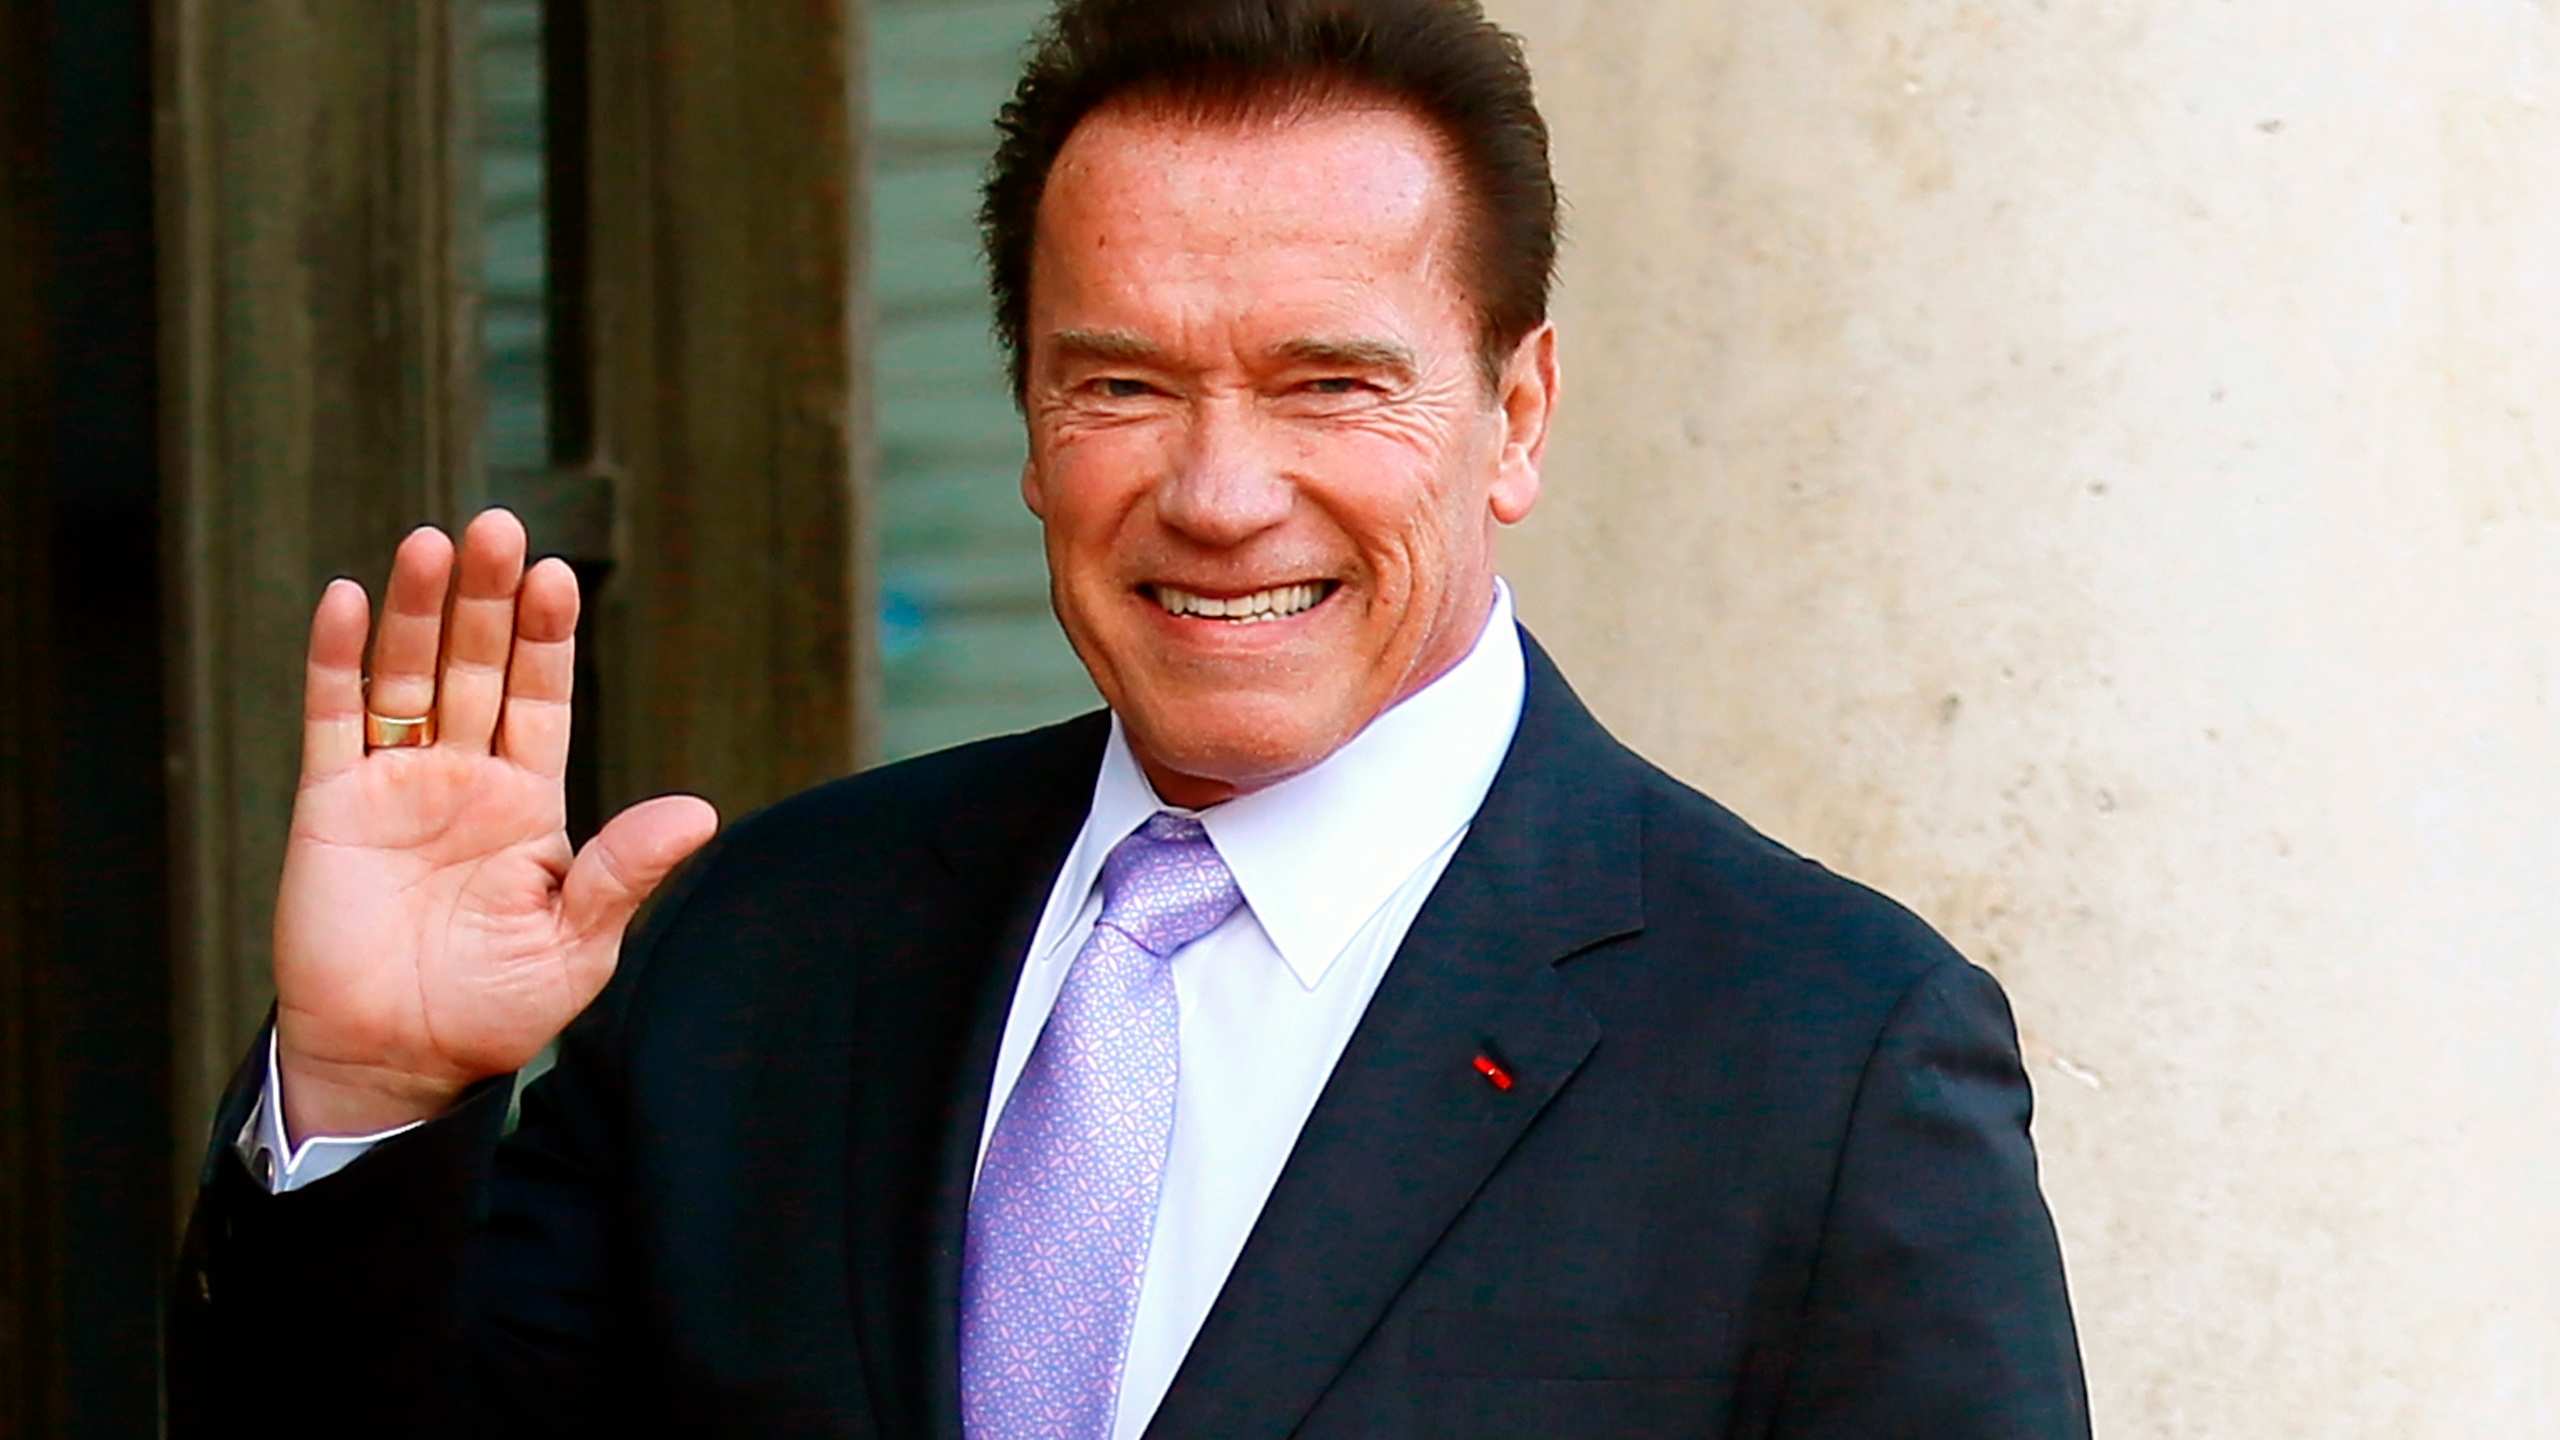 Schwarzenegger_Surgery_35148-159532.jpg77584072